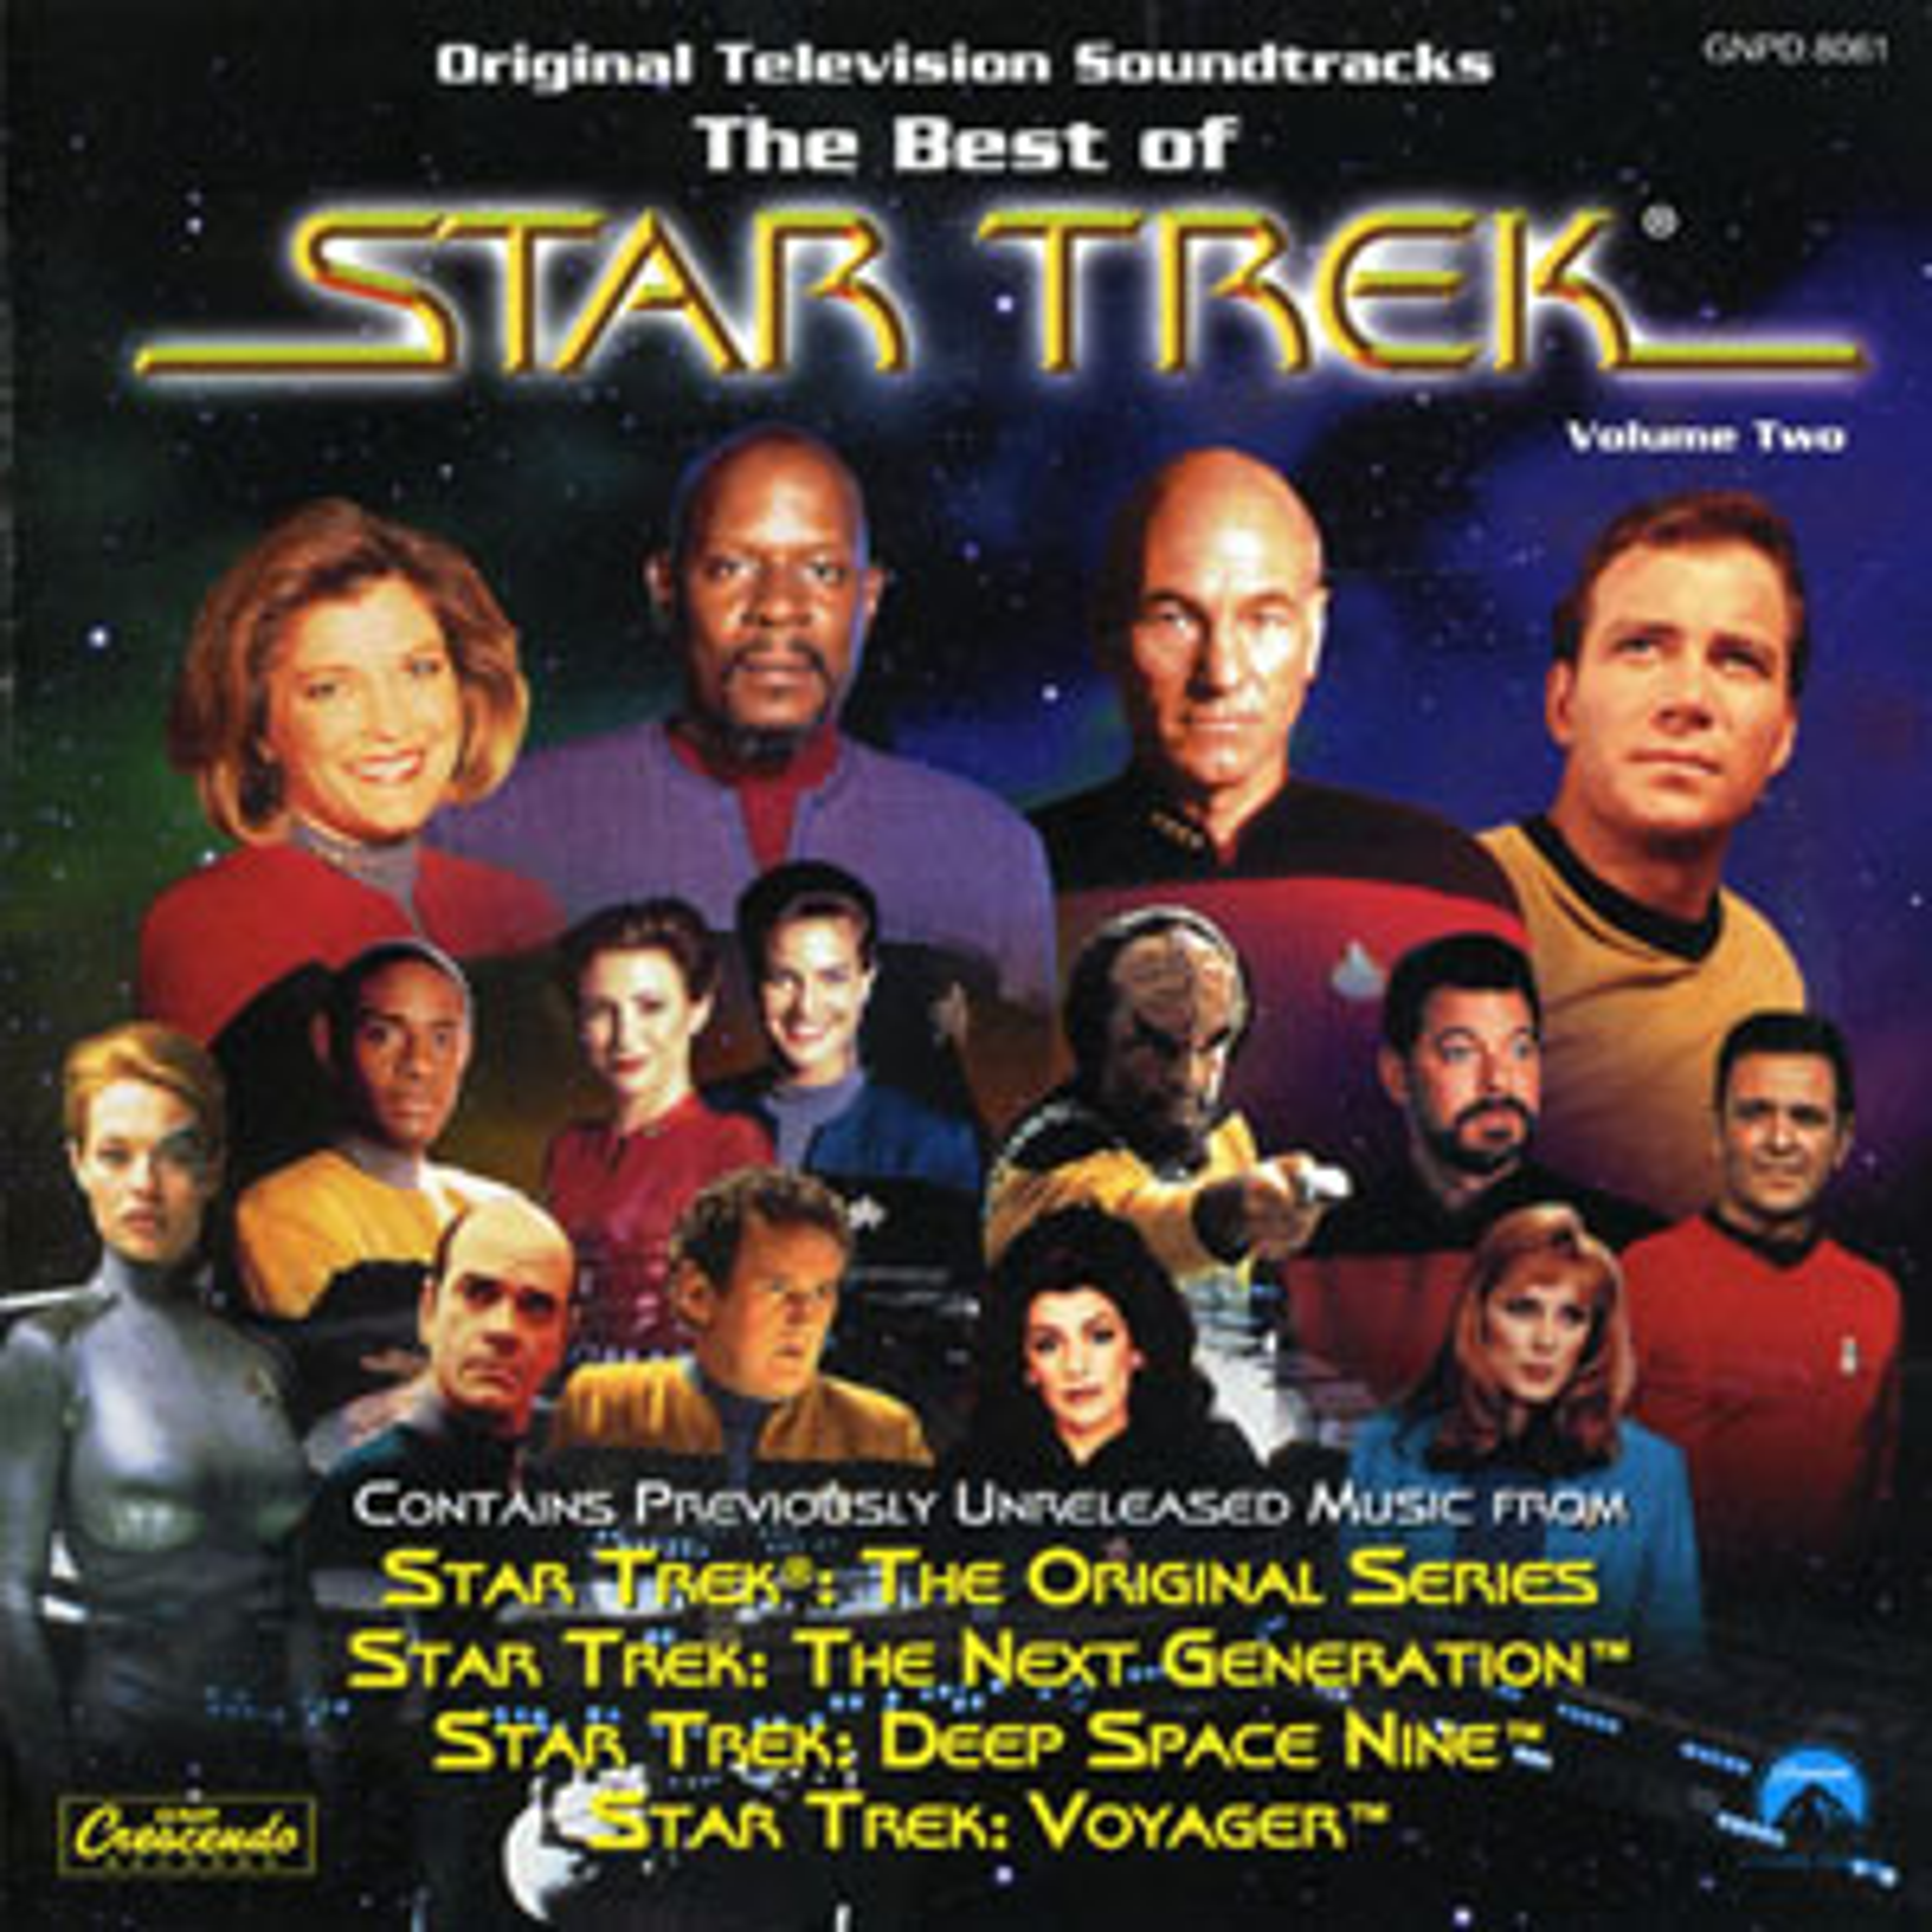 The Best of Star Trek: Volume Two